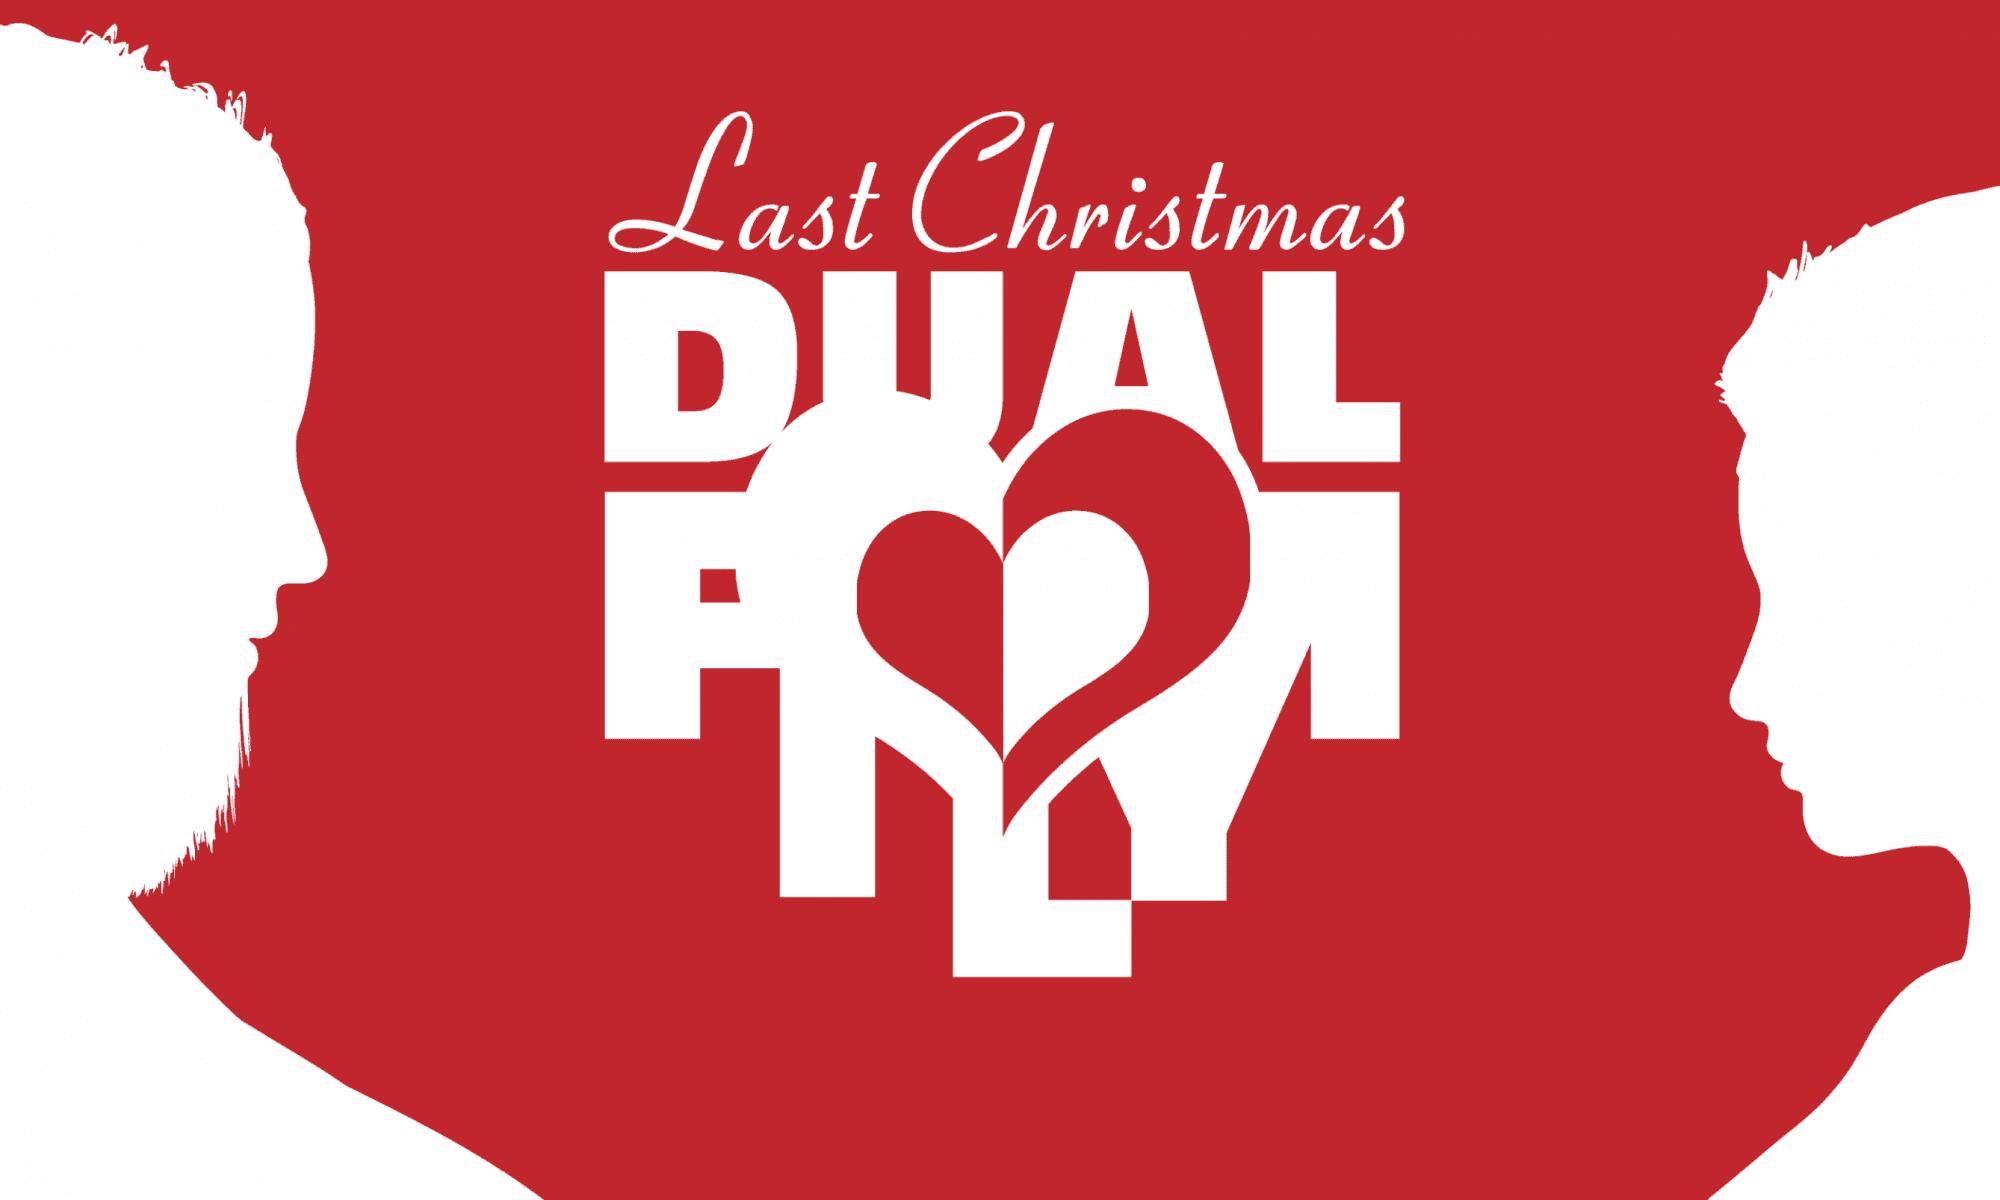 Dual Family – Last Christmas - family PC game 1